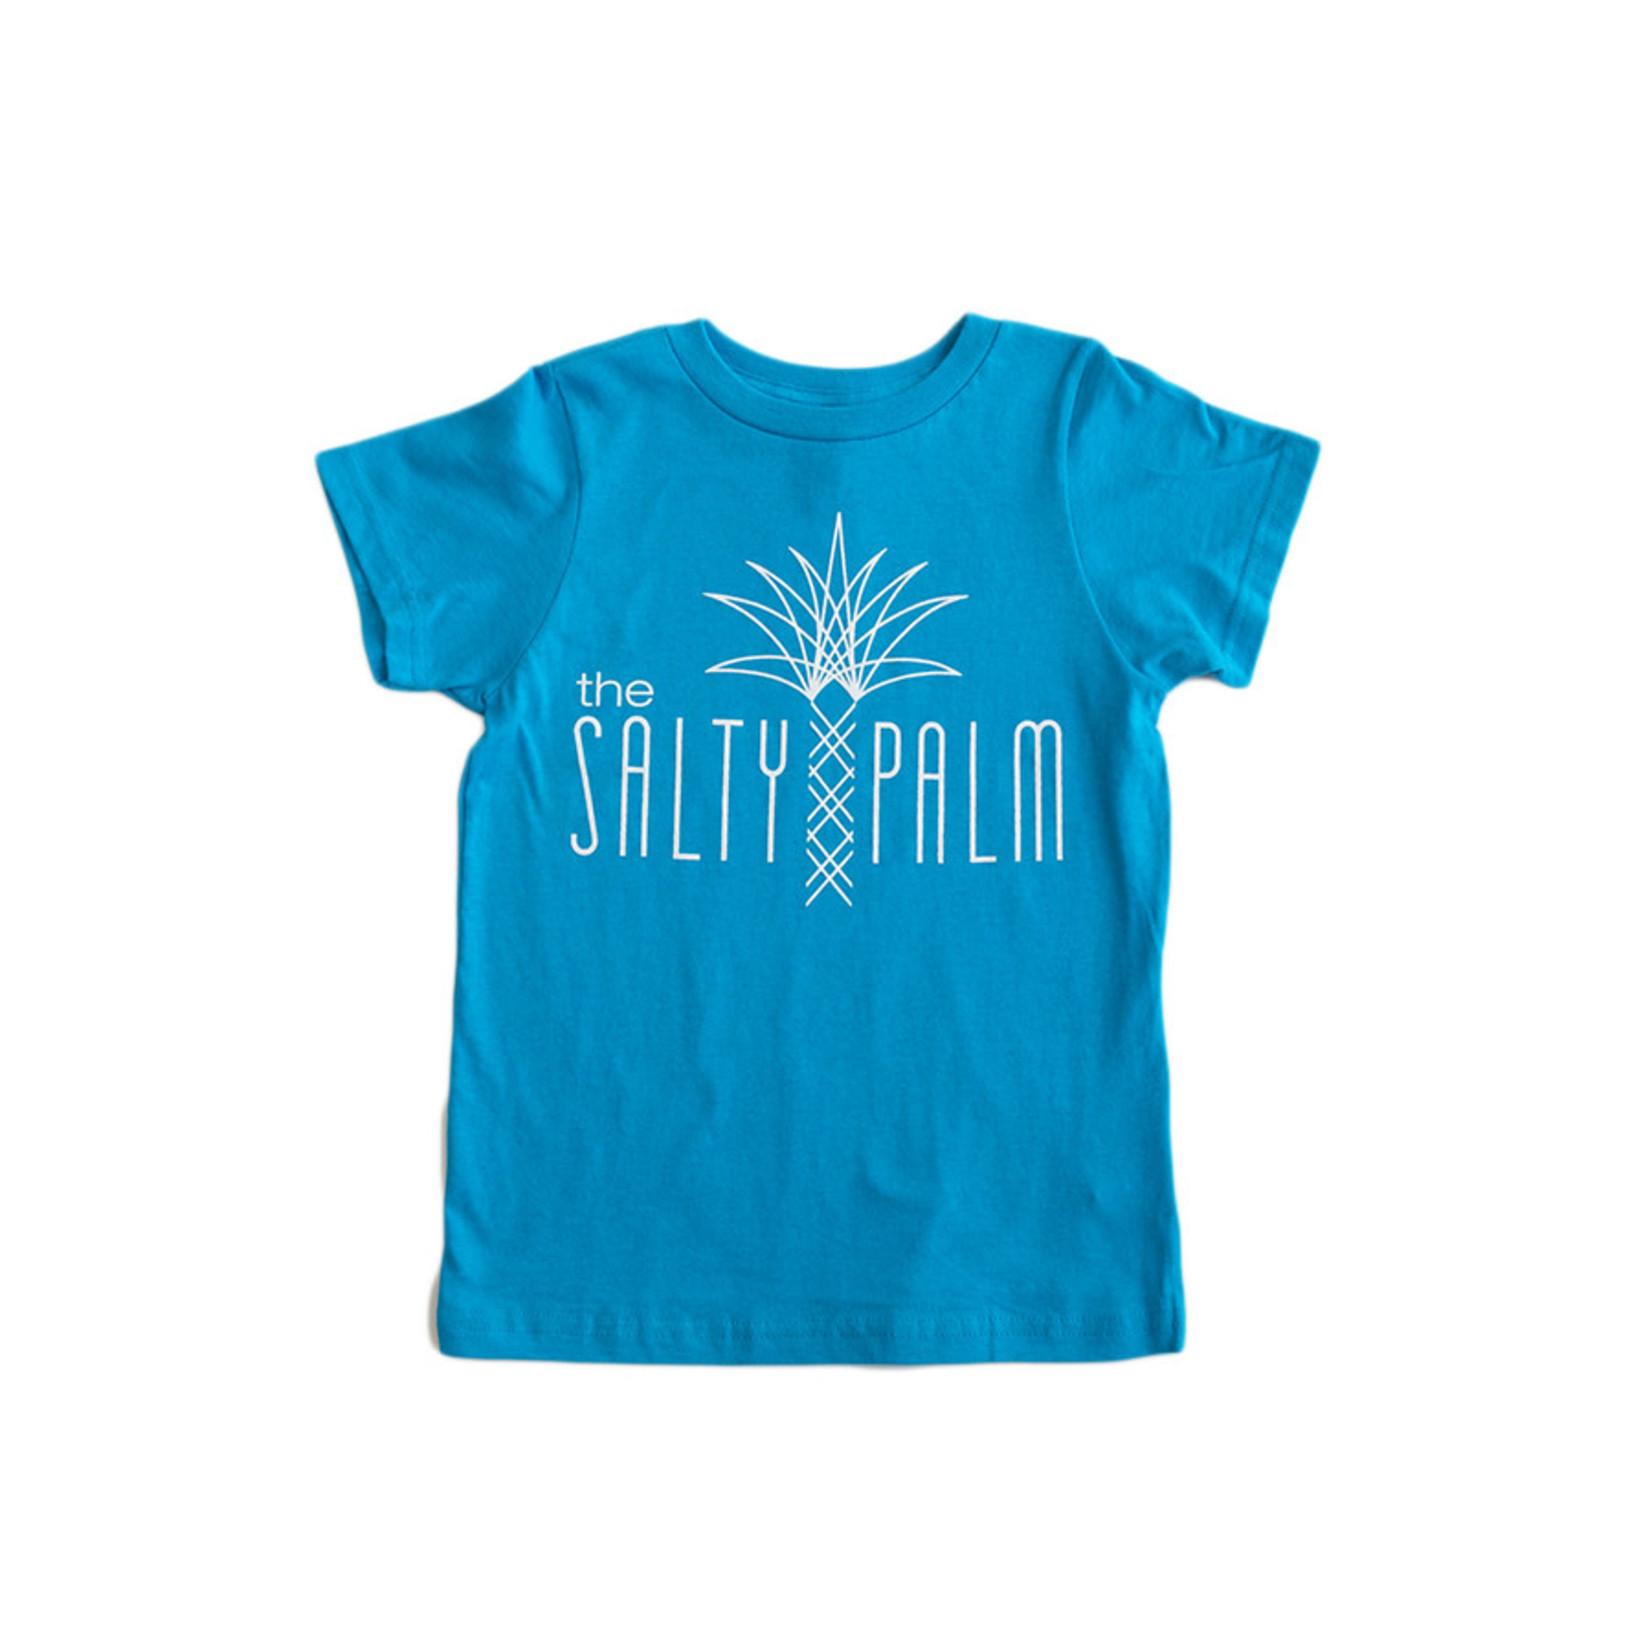 The Salty Palm Youth Short Sleeve Logo Tee